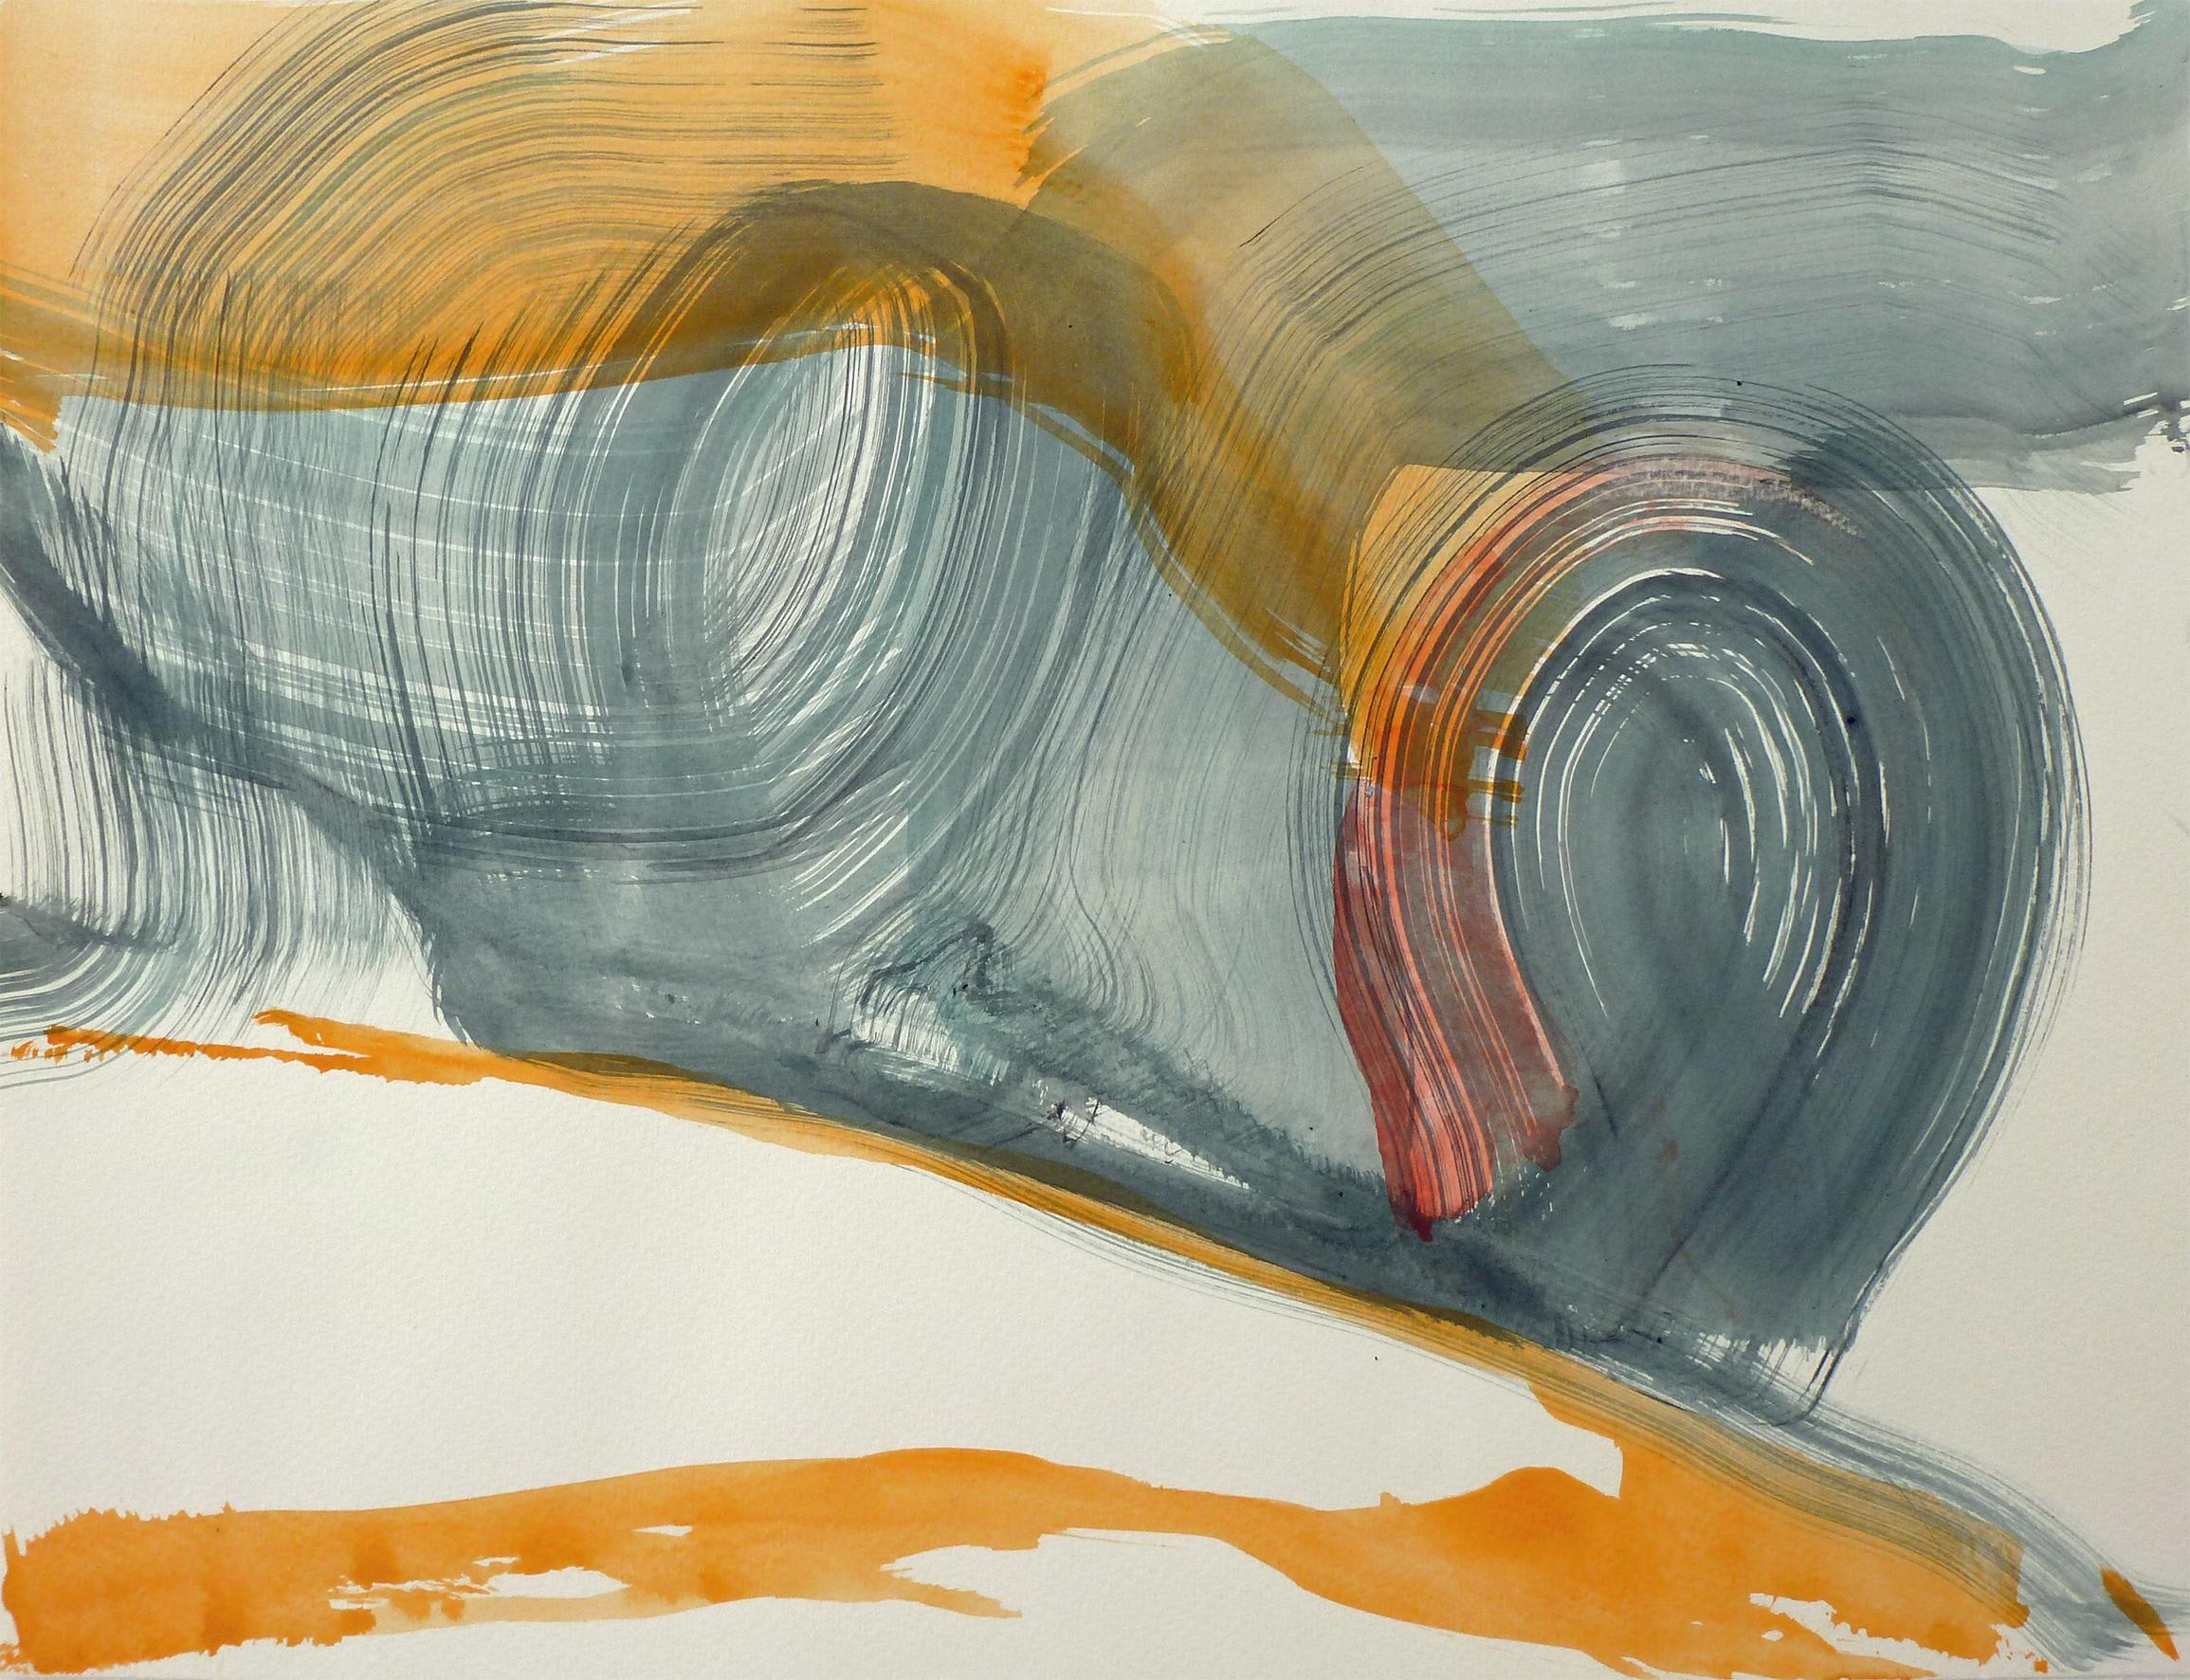 heuballenamhang, 2011, Acryl auf Papier, 36 x 48 cm © Uta Weil, VG Bild-Kunst, Bonn